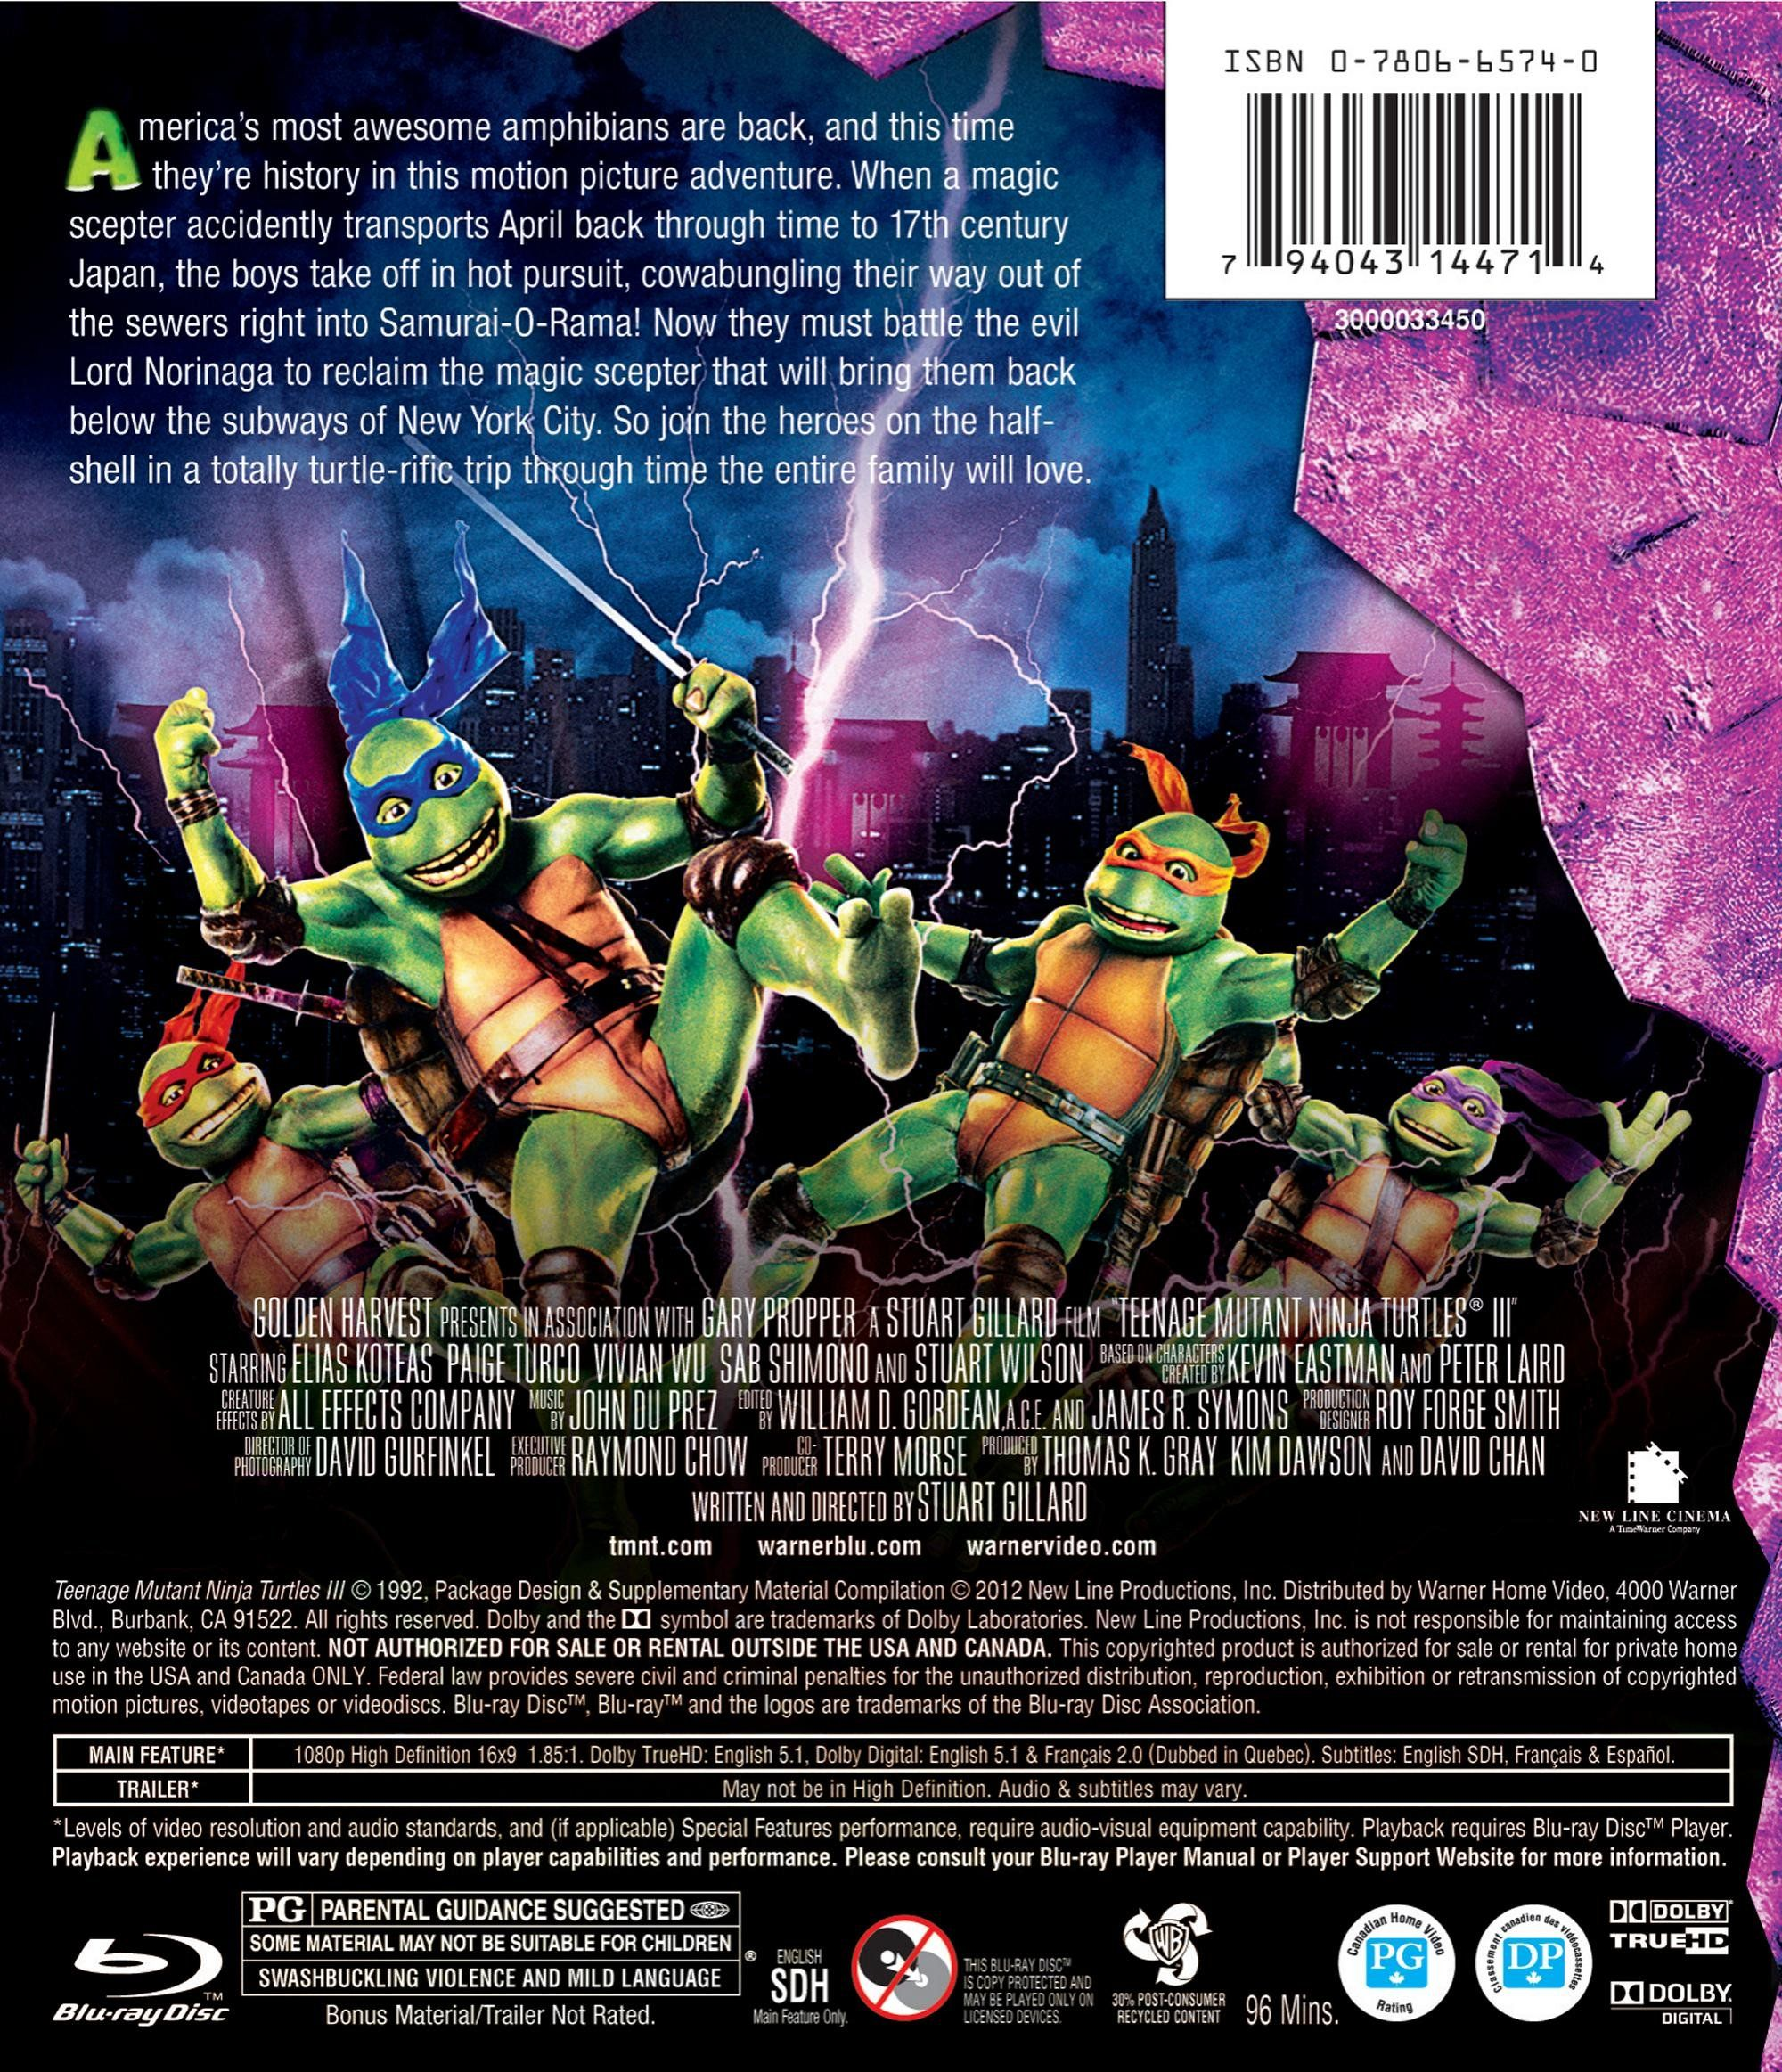 Teenage Mutant Ninja Turtles 3 Edizione Stati Uniti Usa Blu Ray Ad Turtles Edizione Teenage Mutant Ninja Turtles Alternative Movie Posters Ninja Turtles